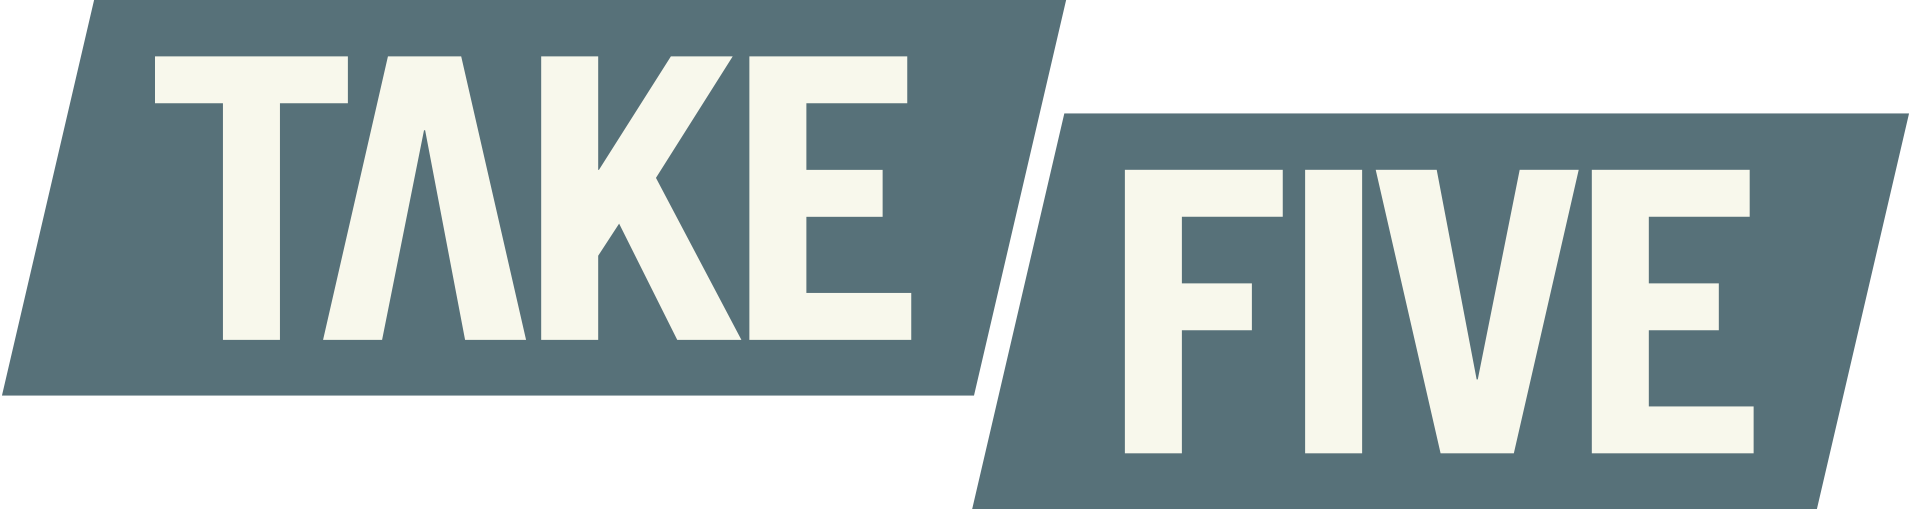 Take-Five films & things